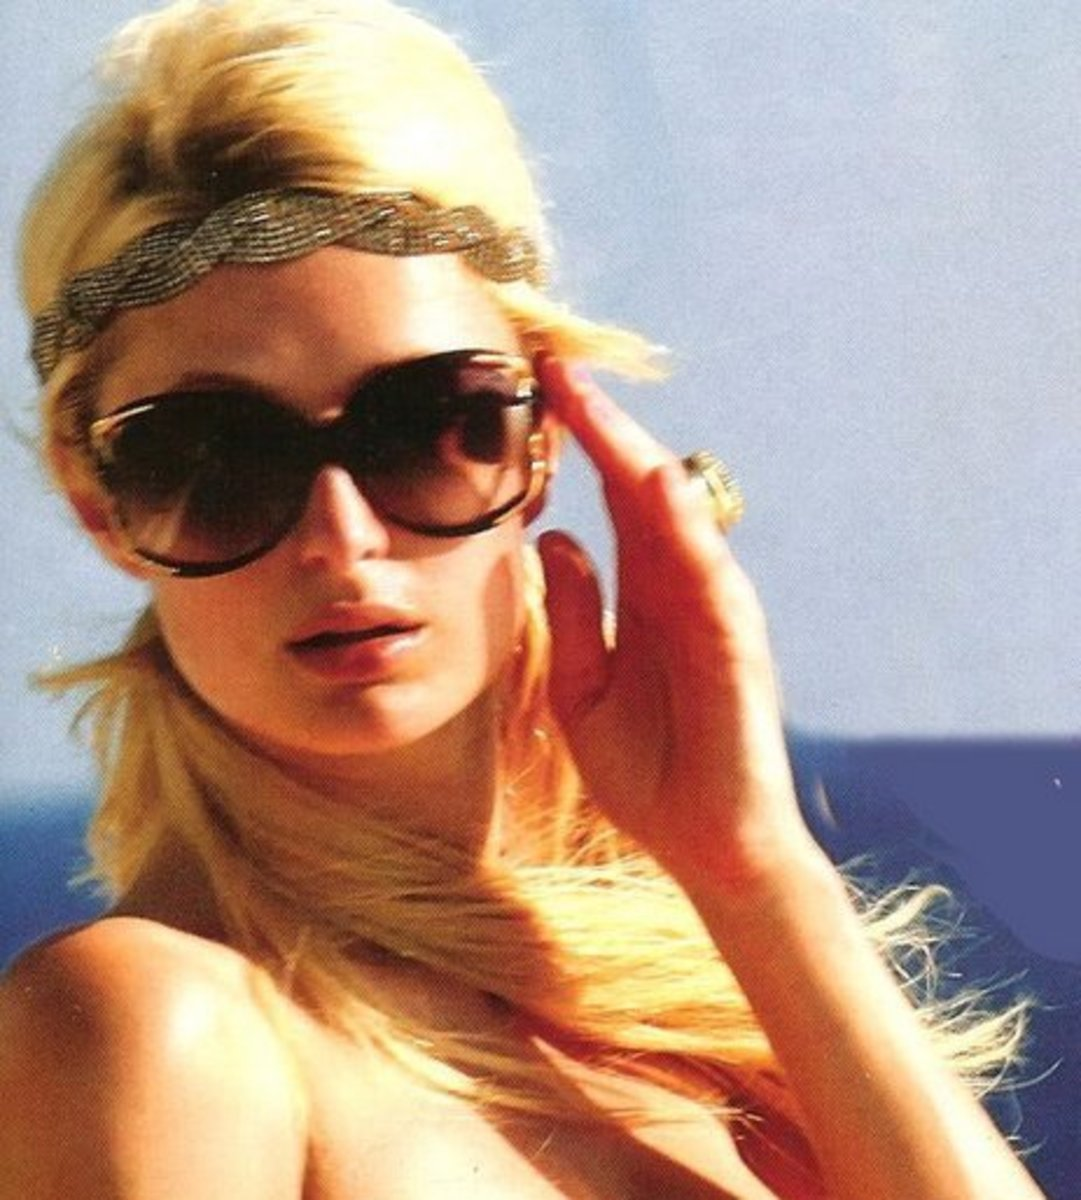 Paris Hilton bikini styles – Pick up the fashion tips from a style icon